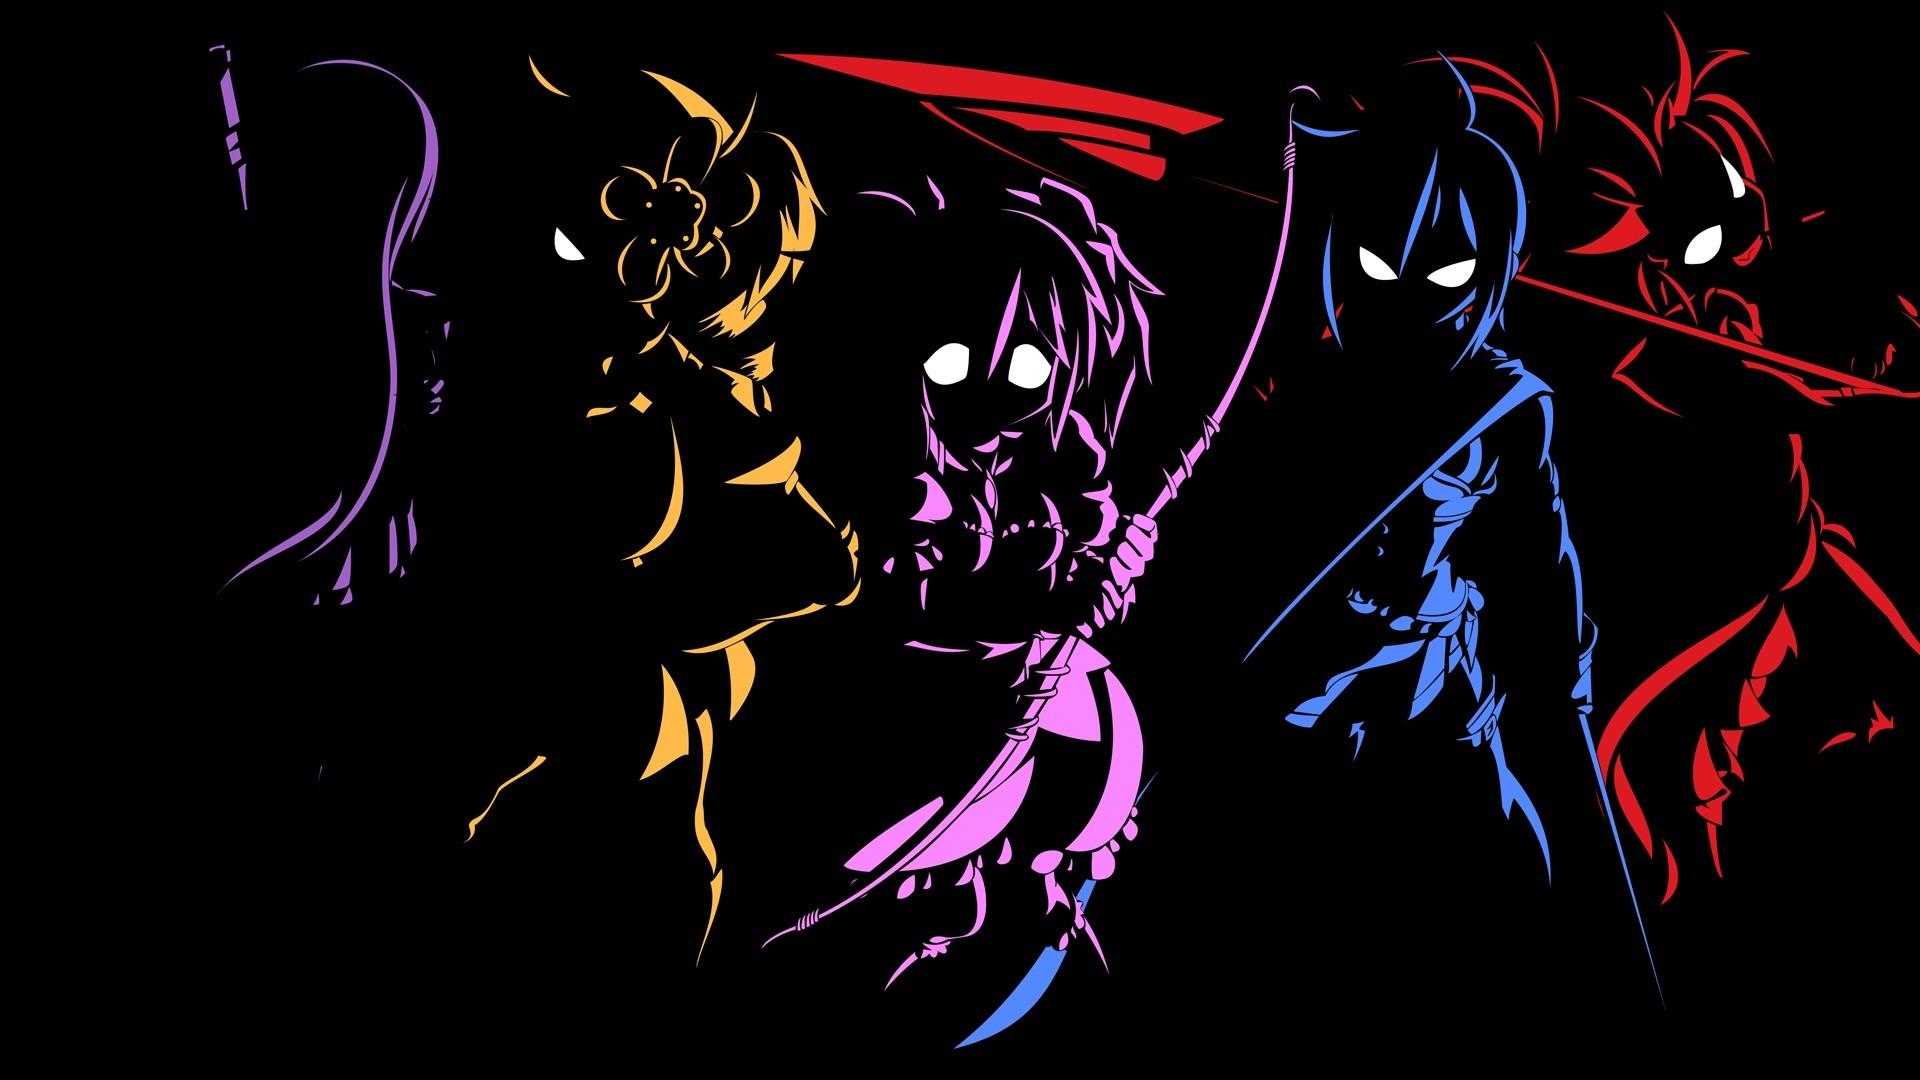 Black Anime Wallpaper 60 Images